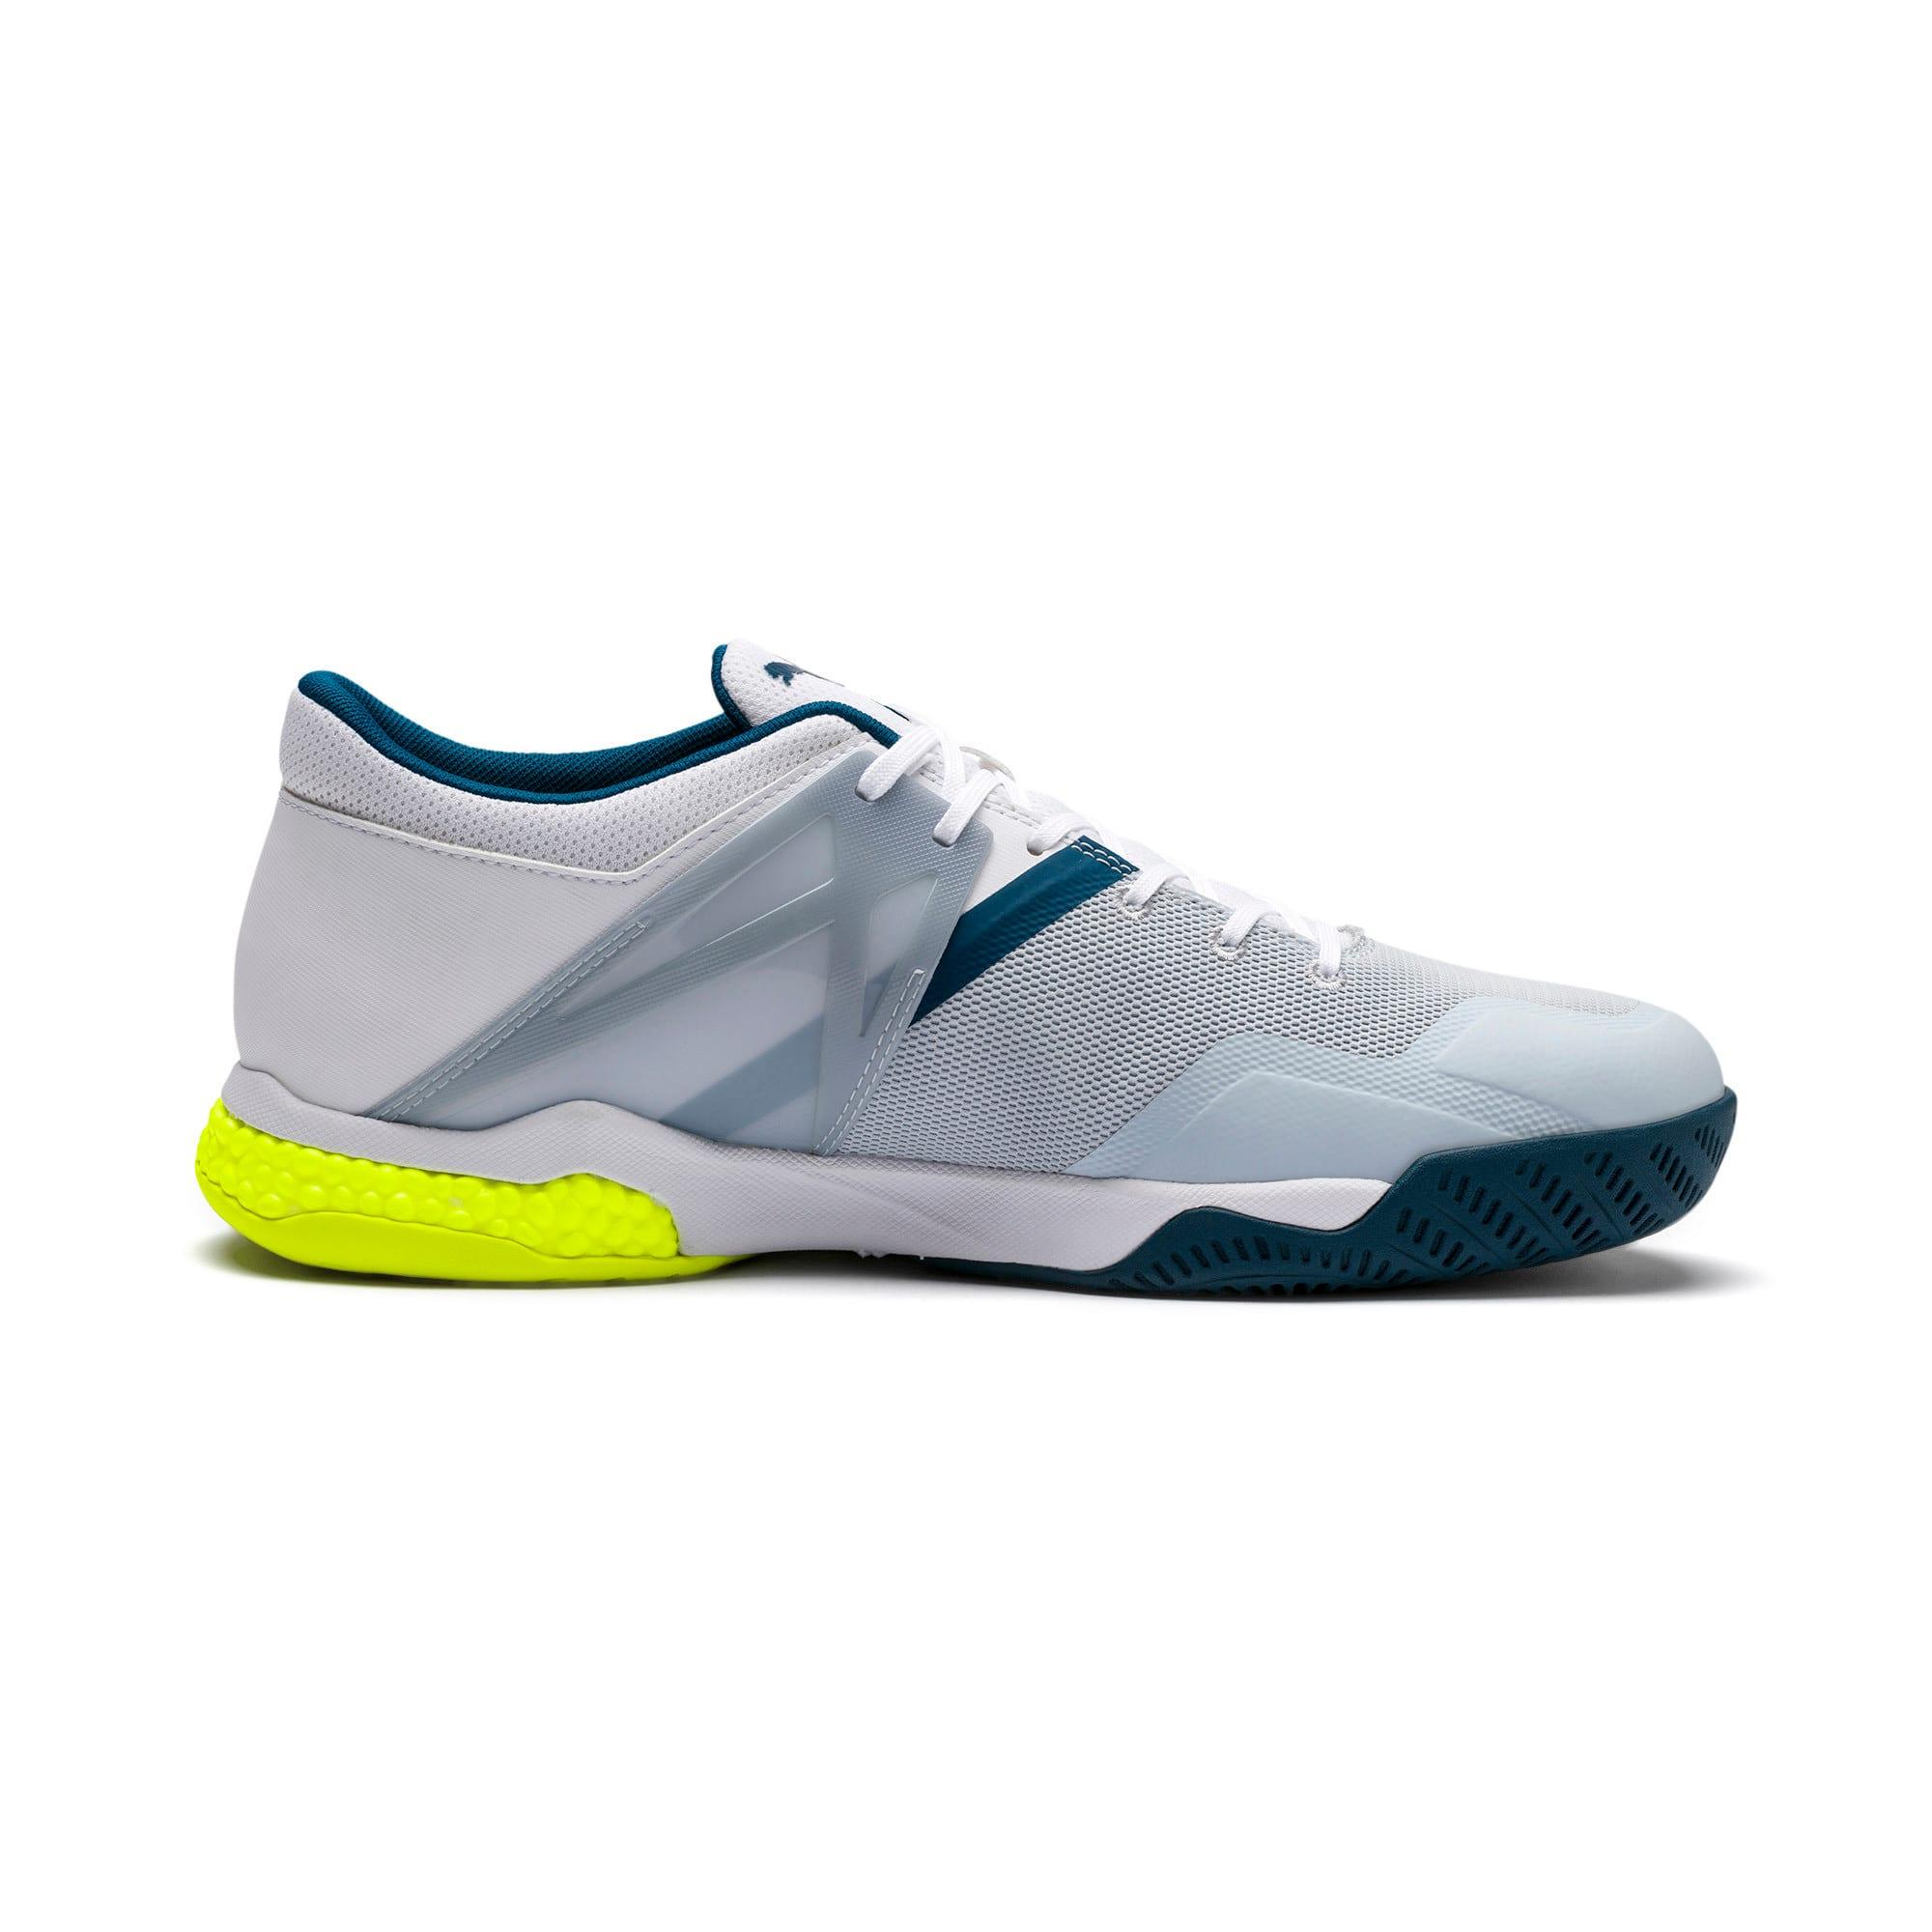 Thumbnail 7 of Explode XT Hybrid 2 Handball Shoes, White-Grey-Yellow-Gibraltar, medium-IND